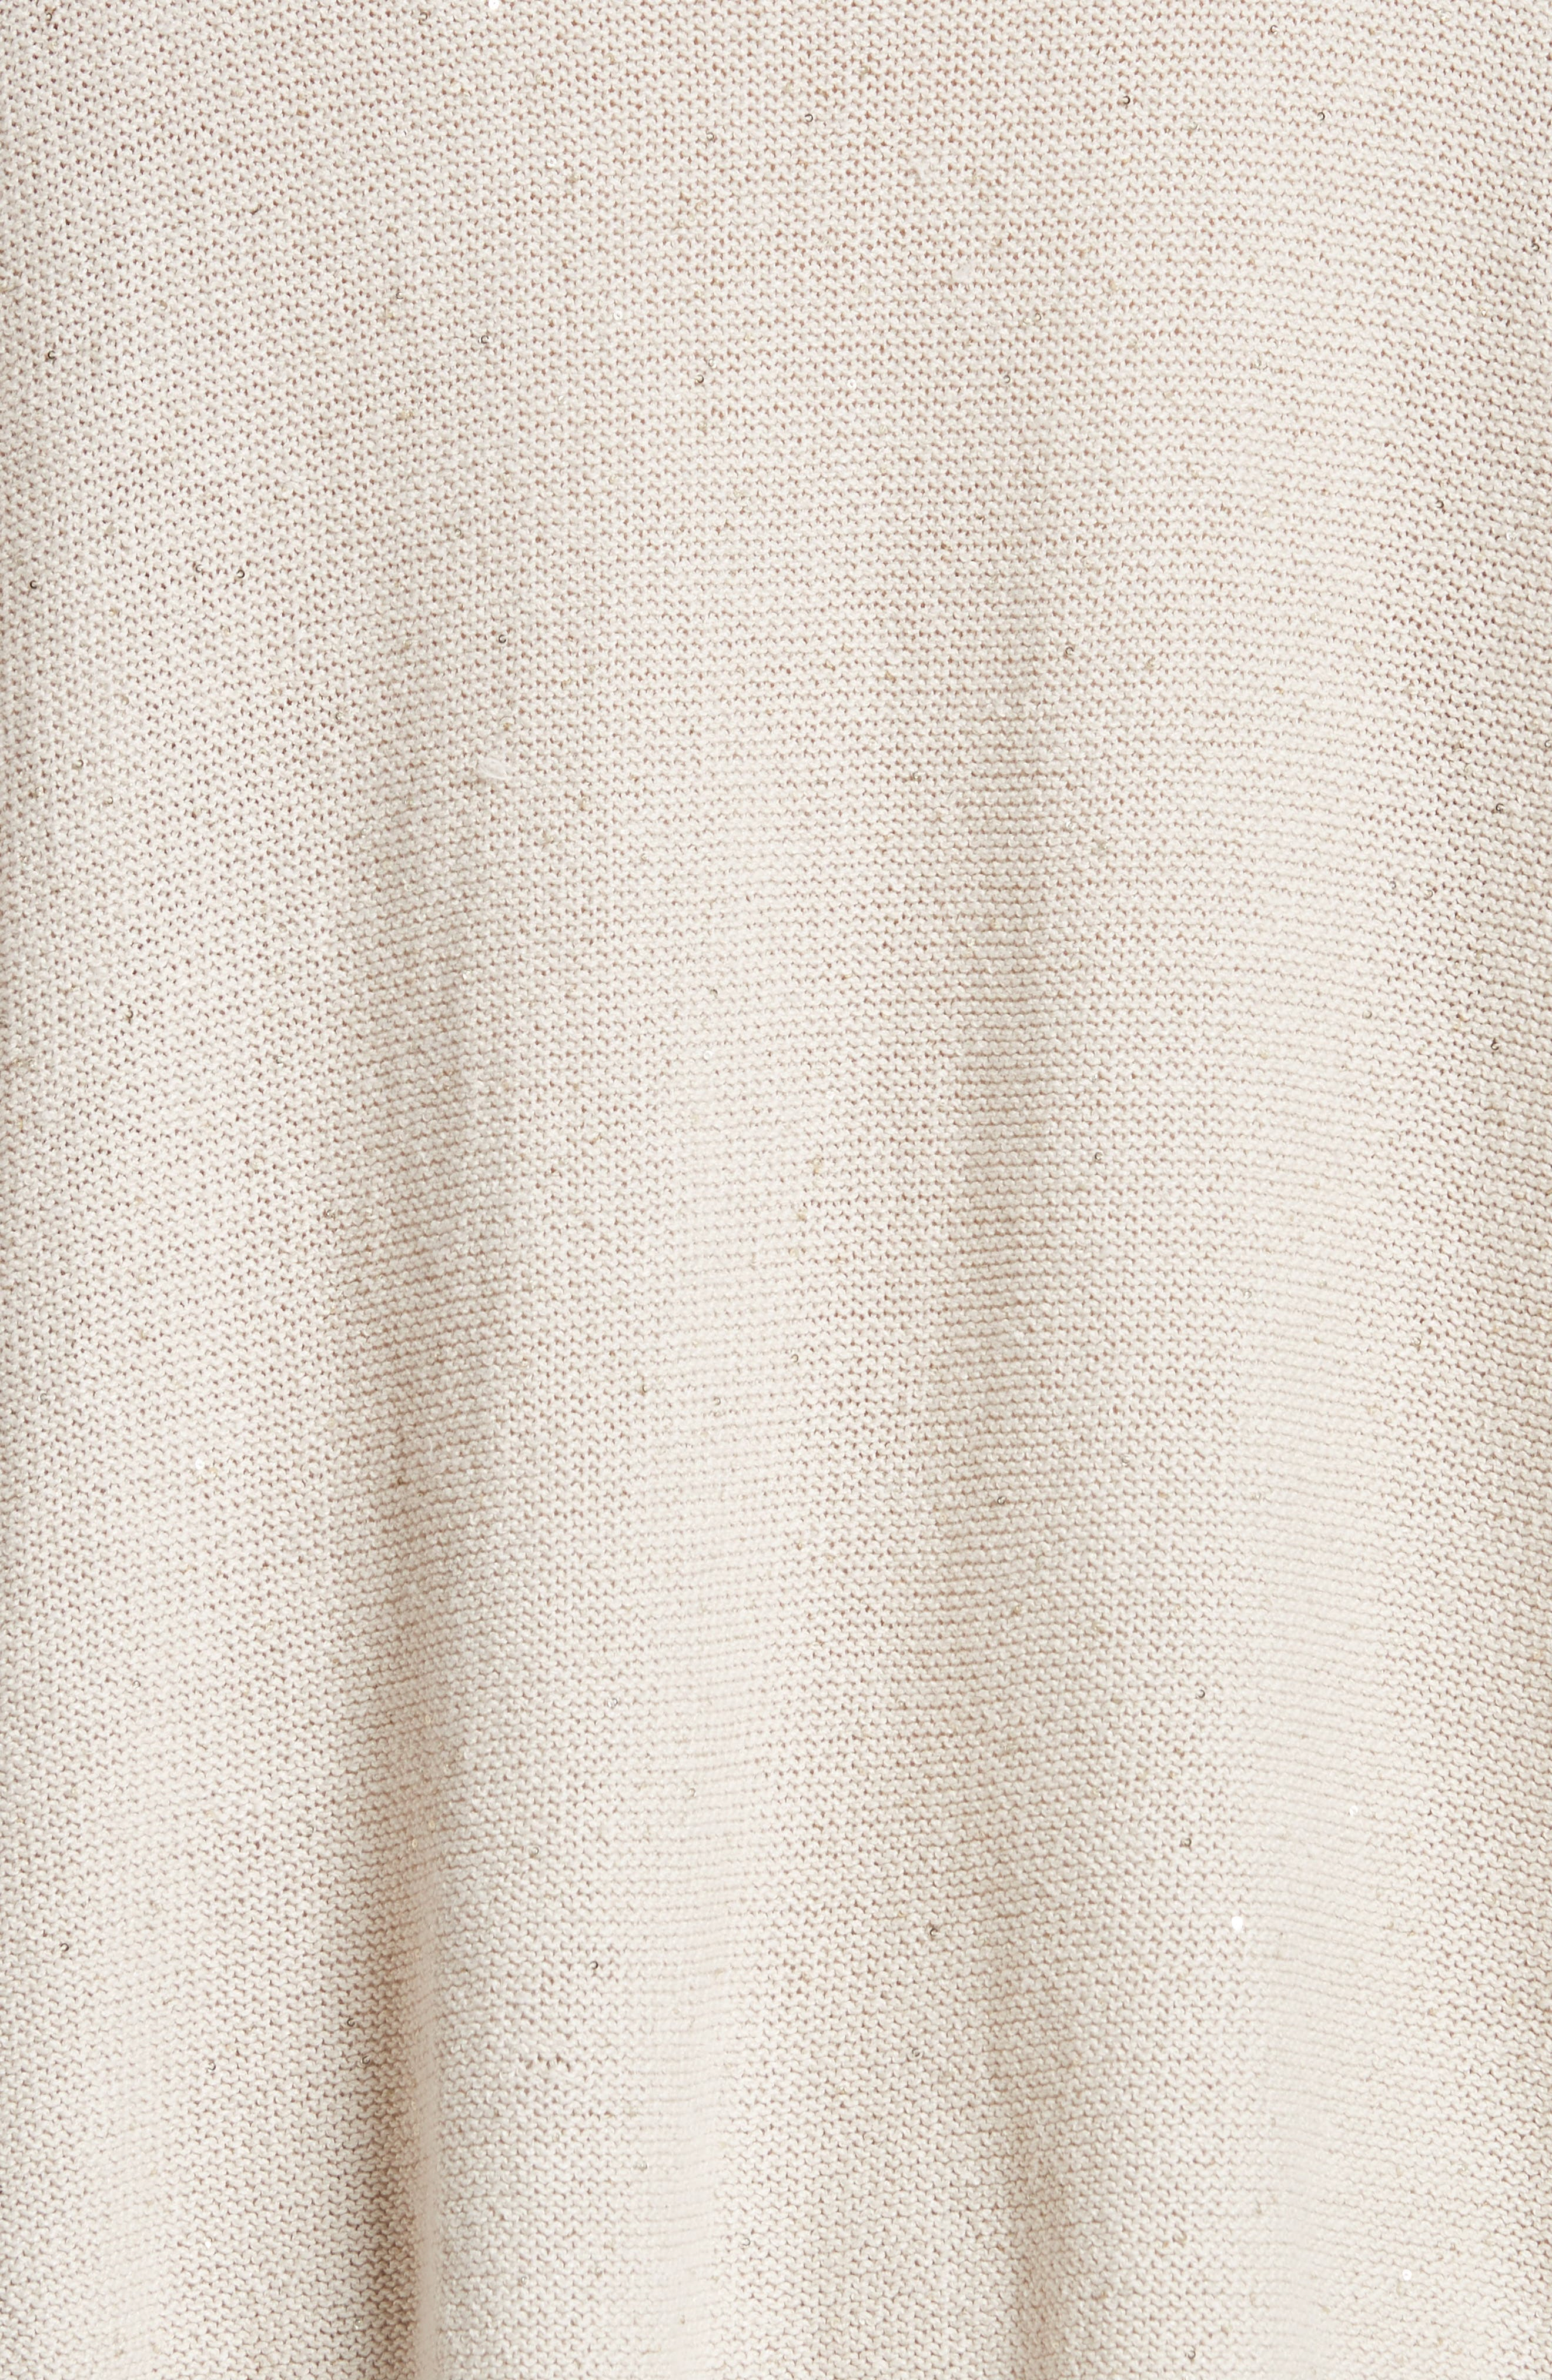 Sequin Knit Dolman Sweater,                             Alternate thumbnail 5, color,